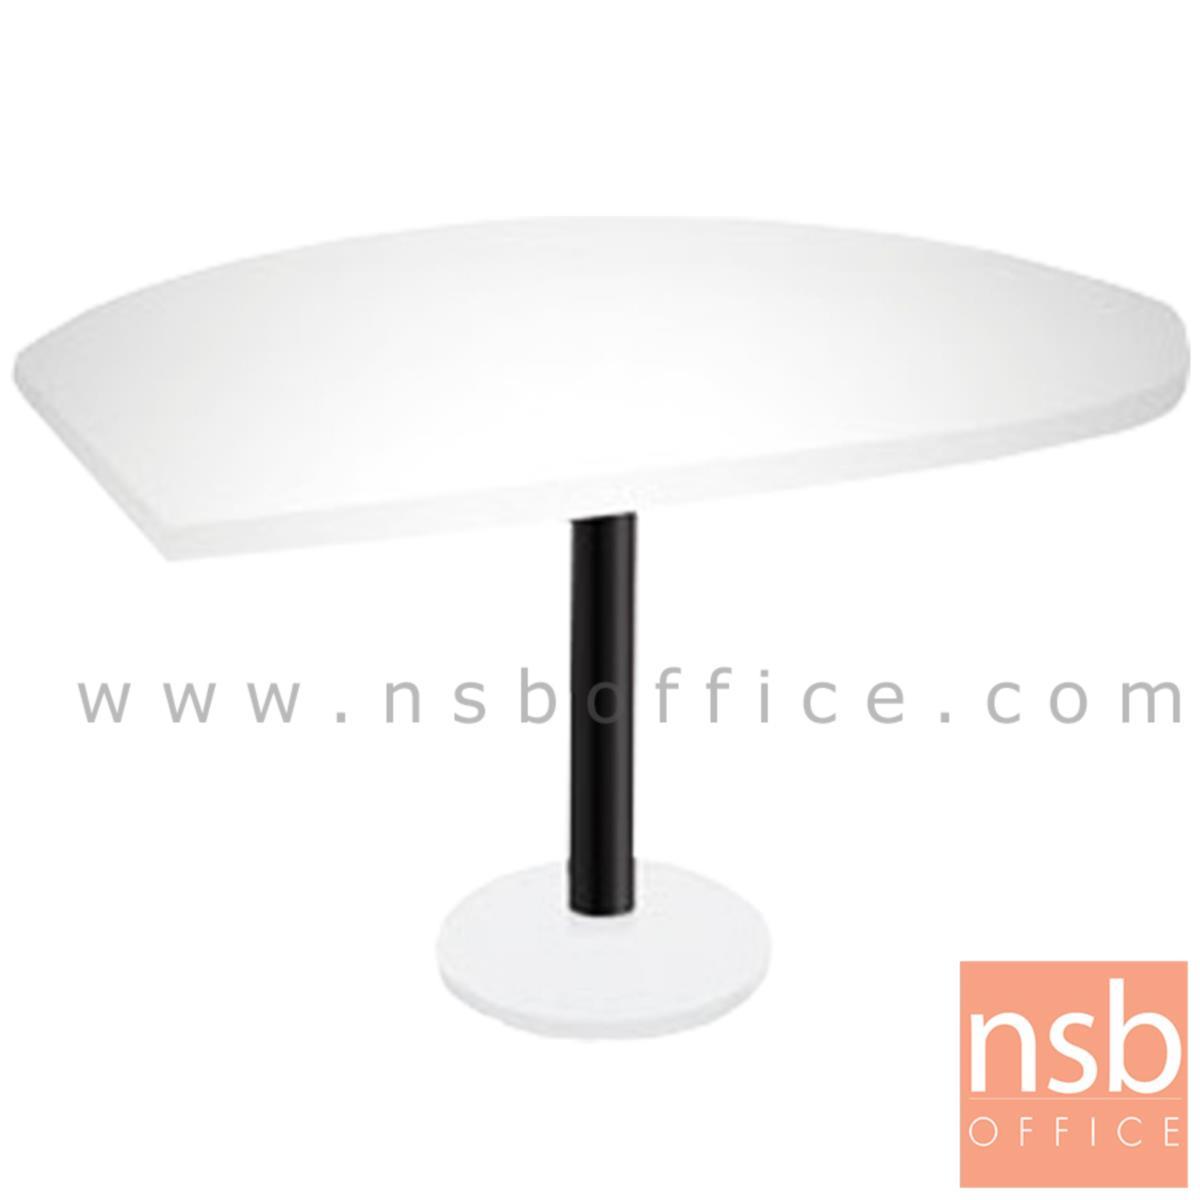 A20A022:โต๊ะเข้ามุม  รุ่น Ashford (แอชฟอร์ด) ขนาด 119.6W cm. เสาดำ พร้อมฐานรอง